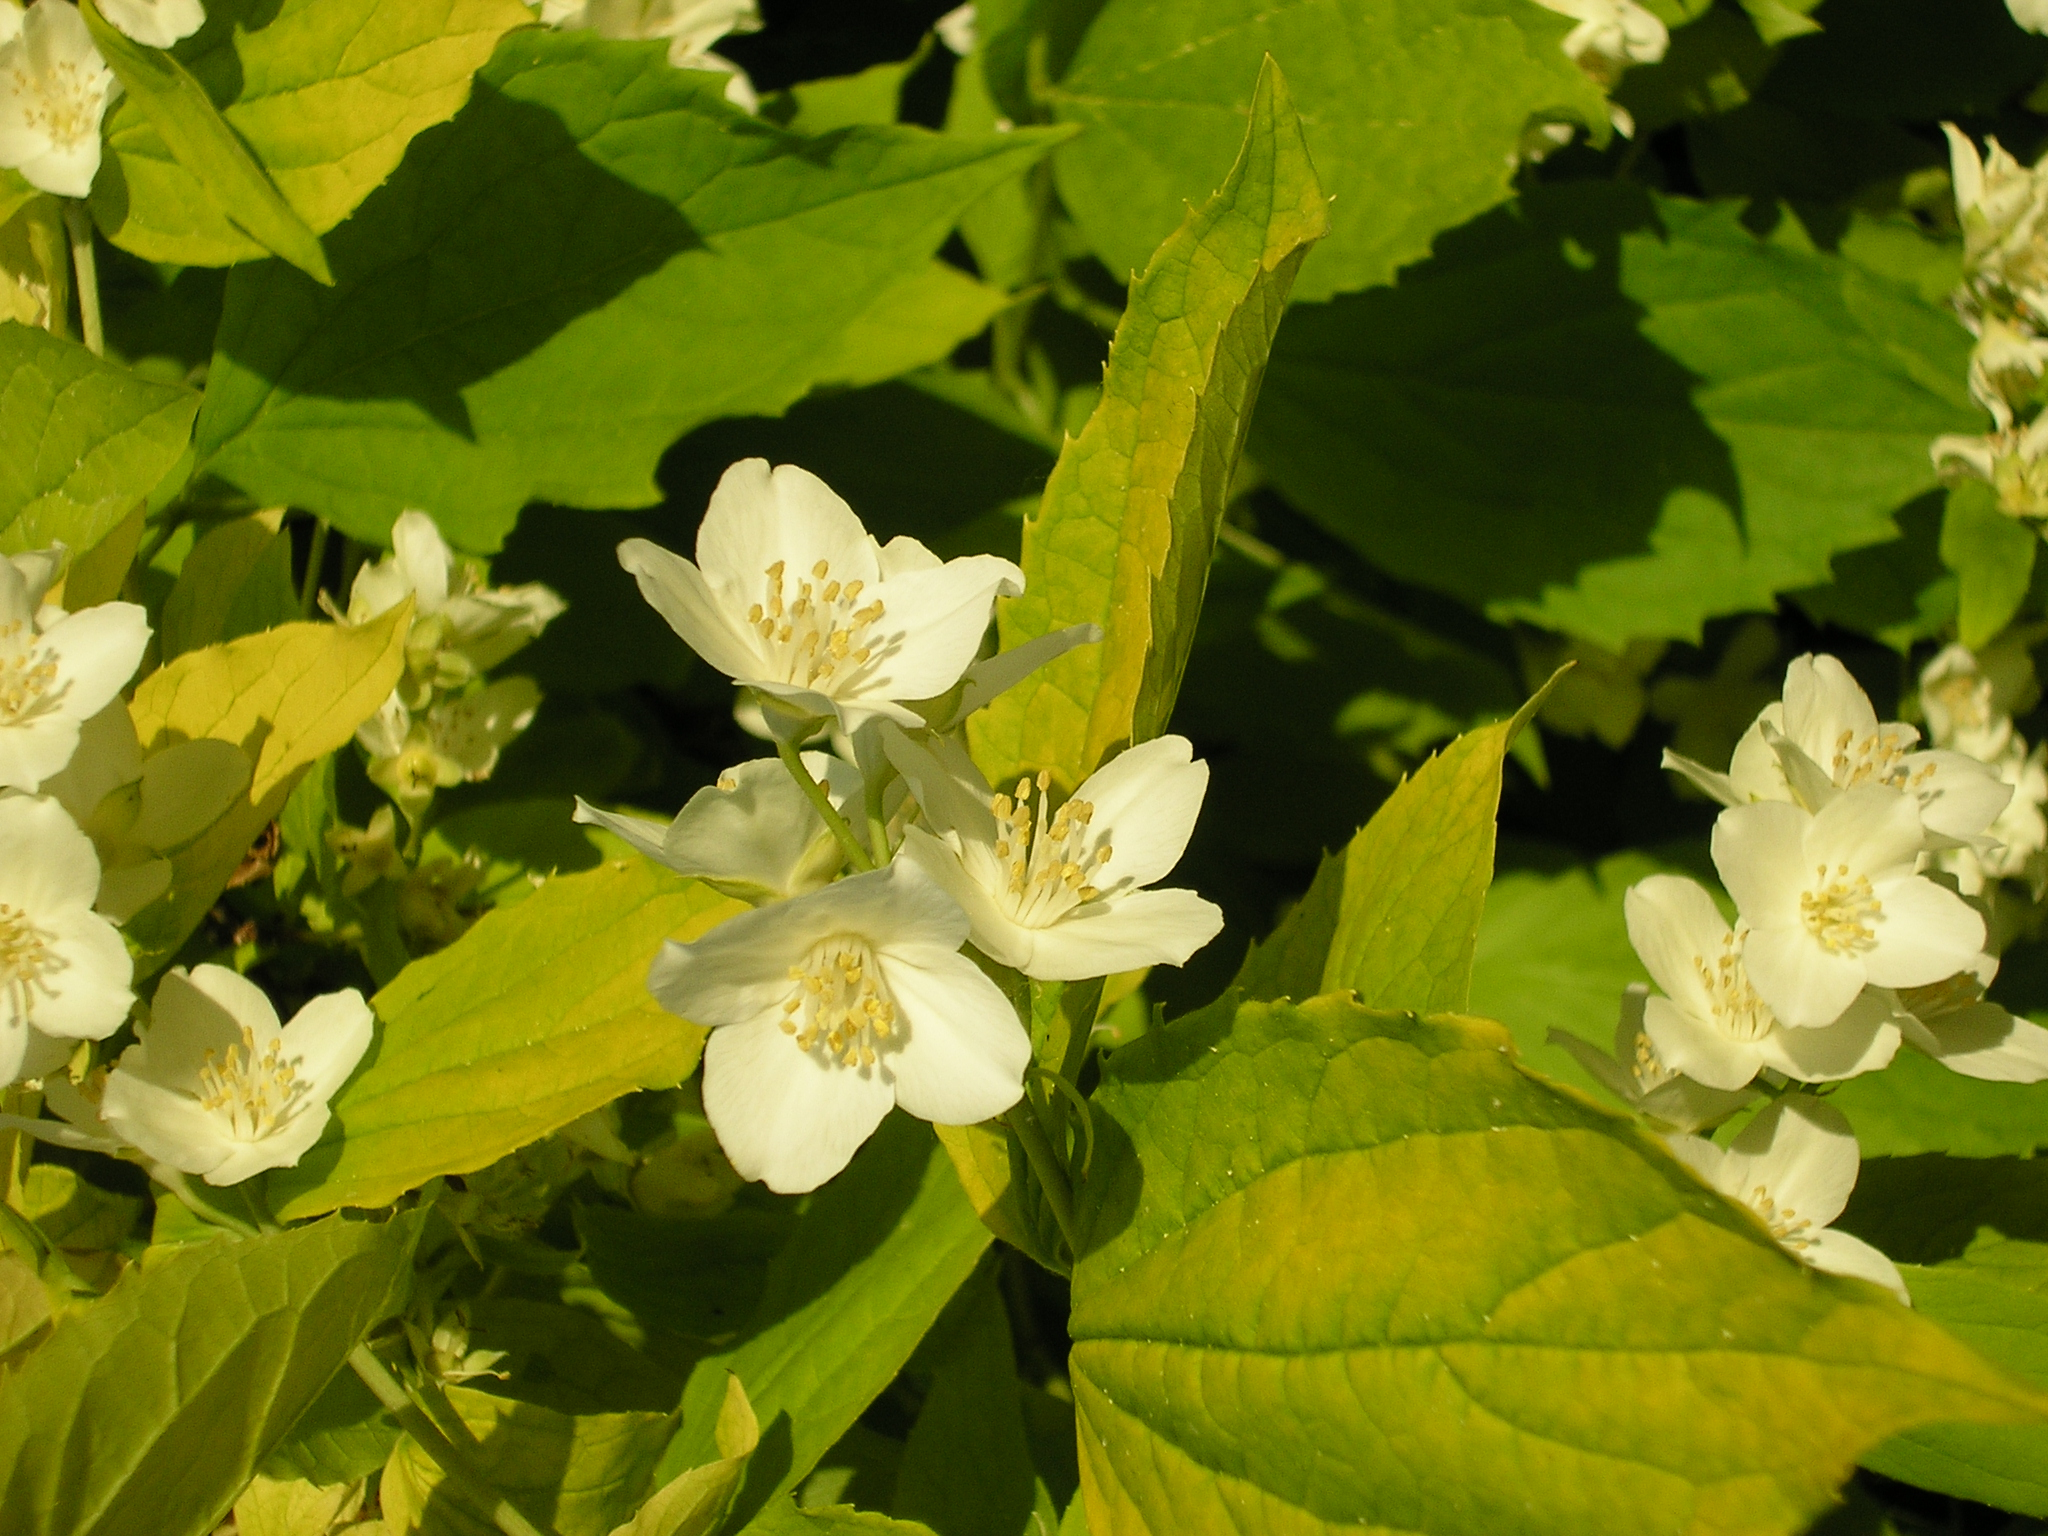 Philadelphus blossom